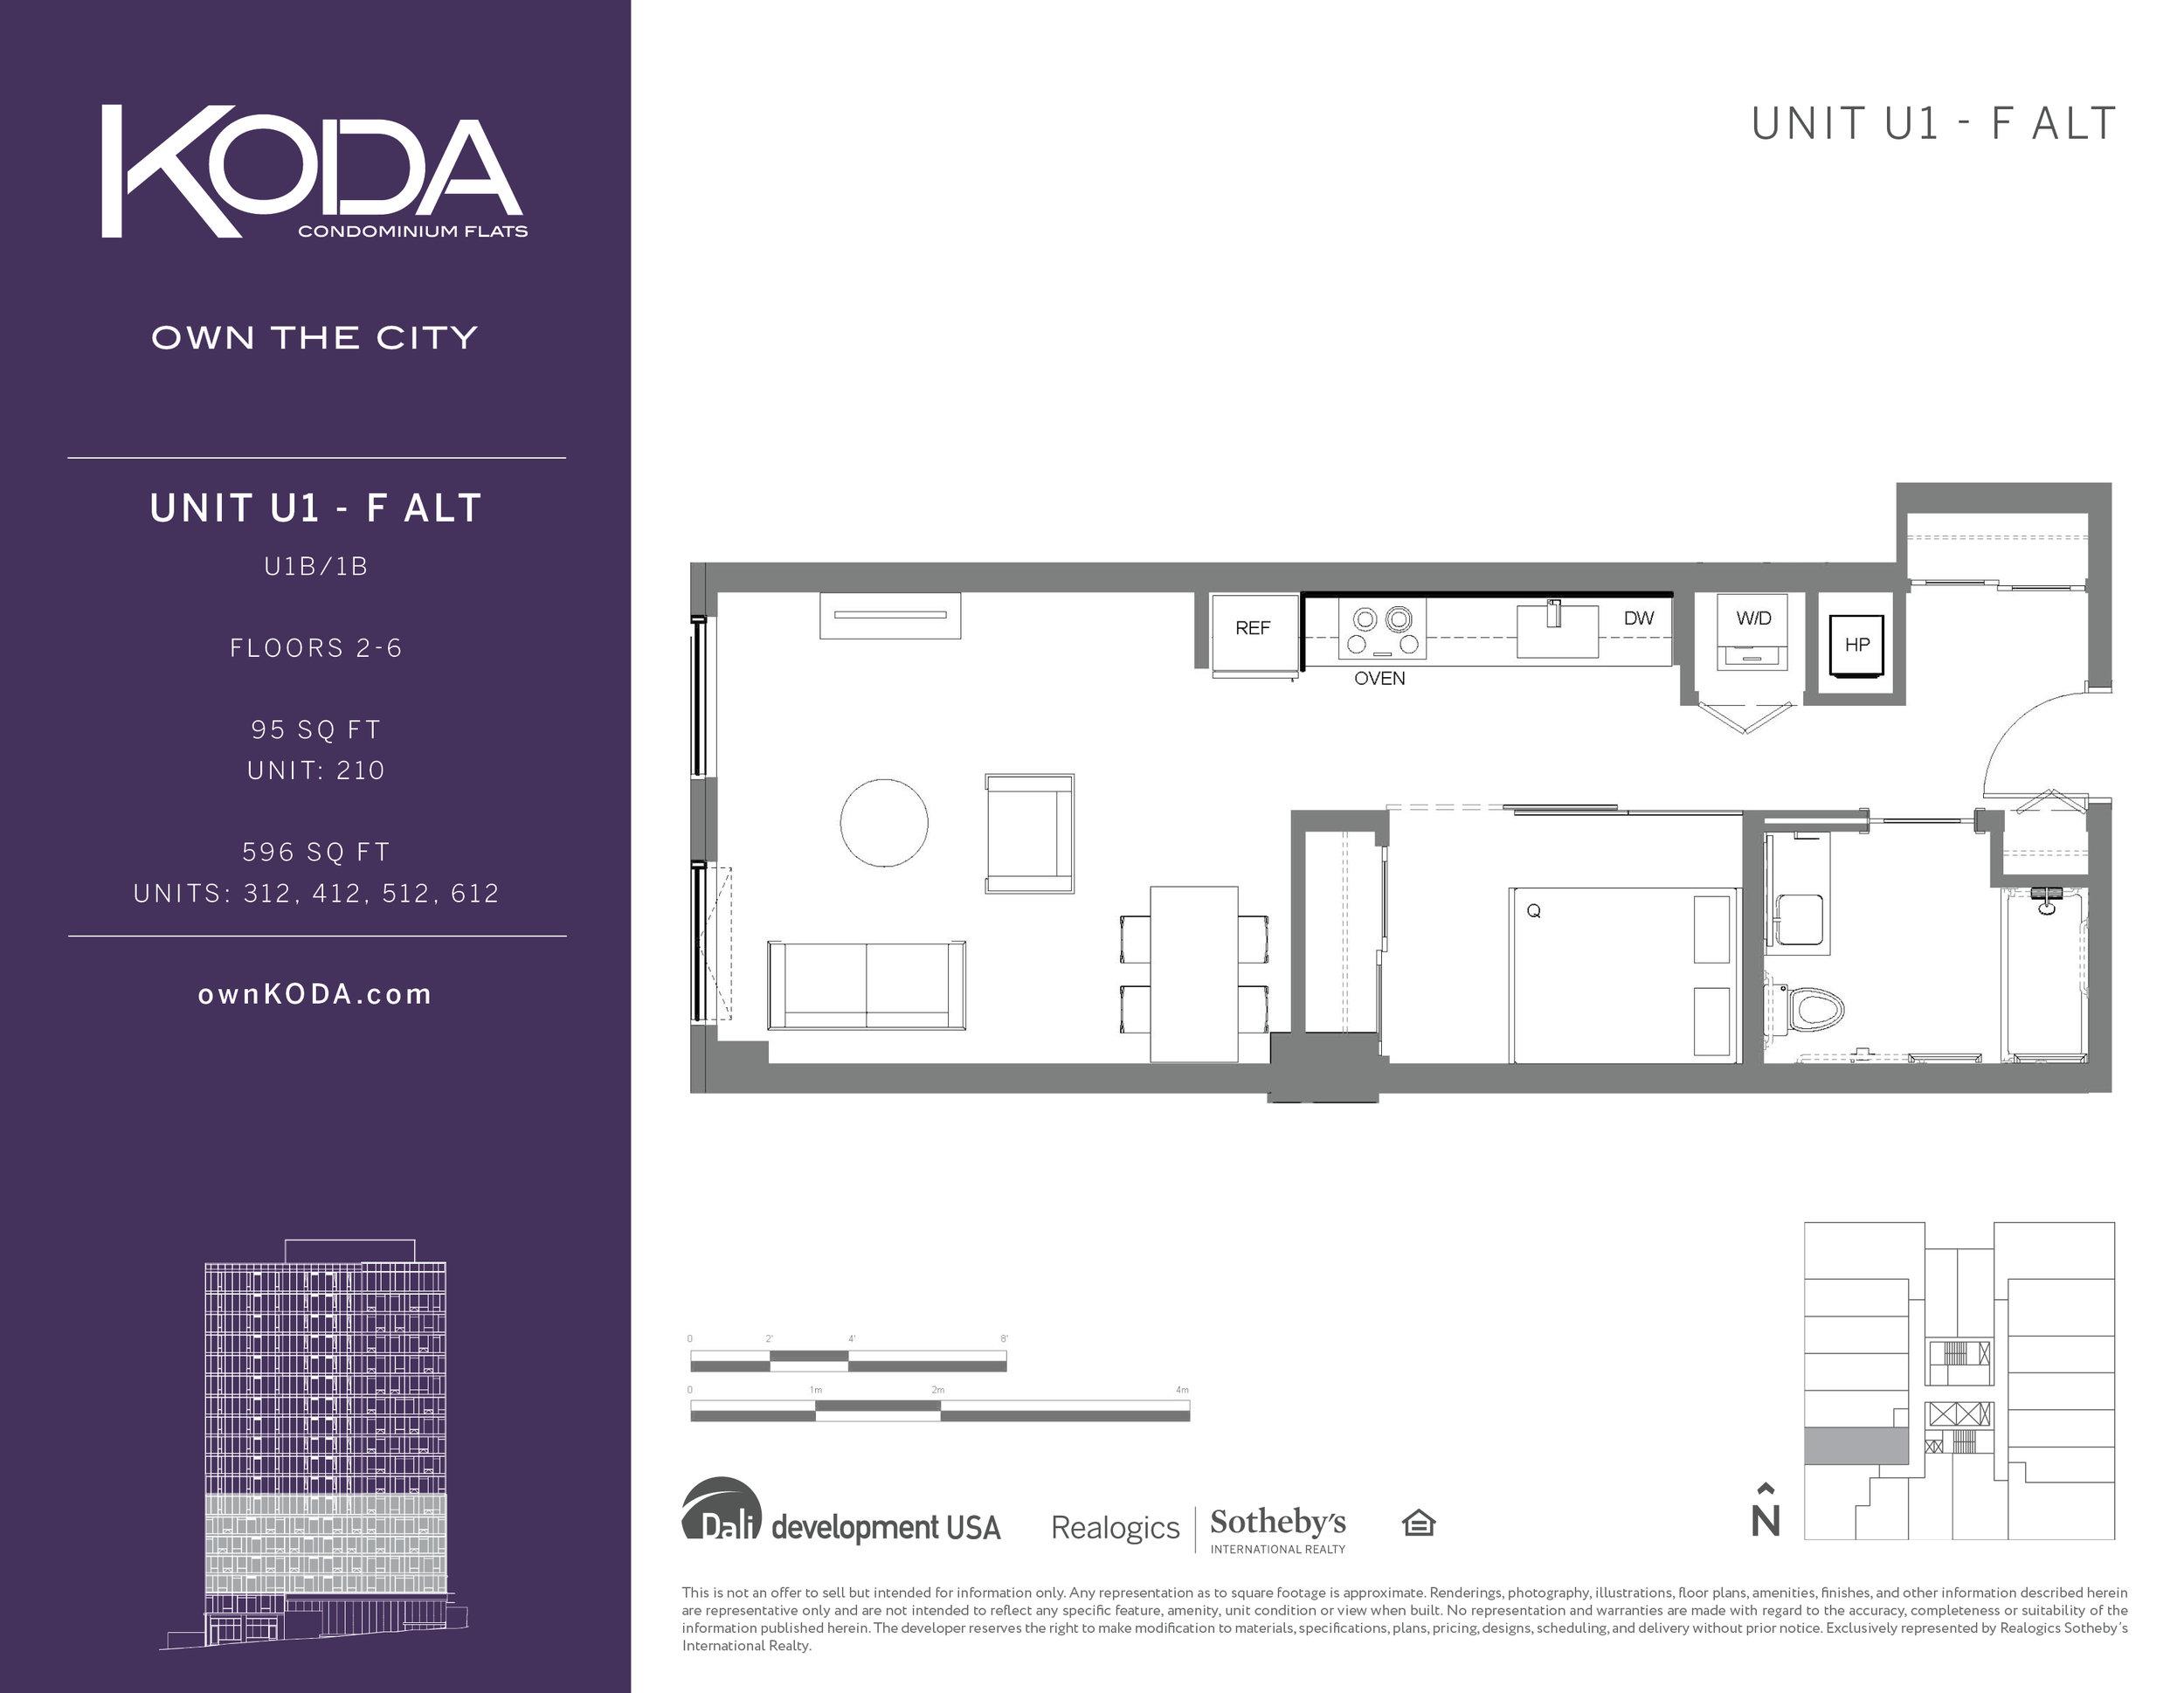 KODA_FloorPlanFlyer_Update_Approved_04.04.19_Release12.jpg